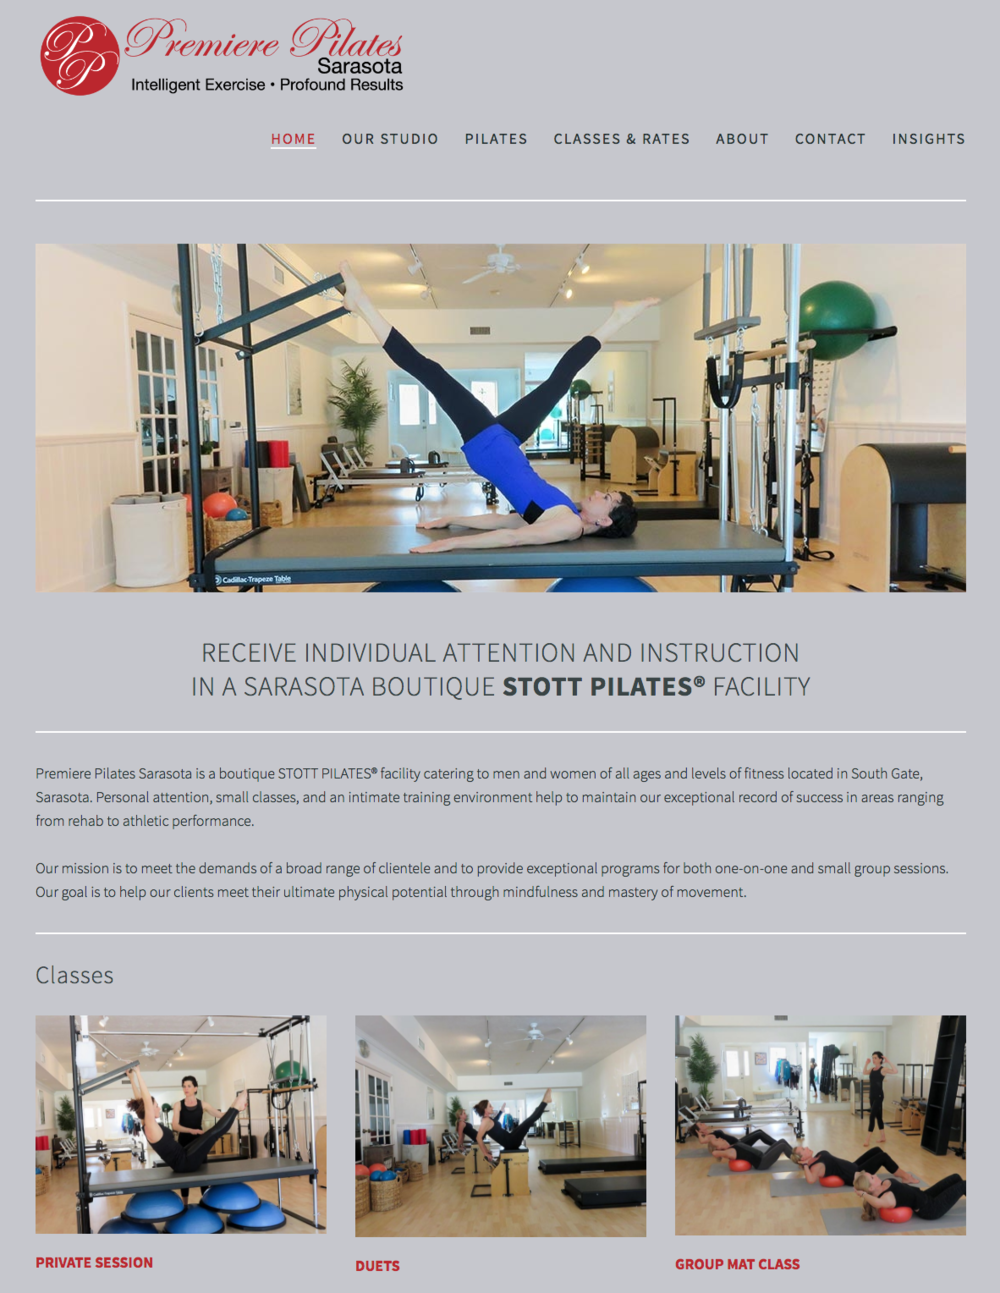 premiere-pilates-sarasota-web-home-page.png